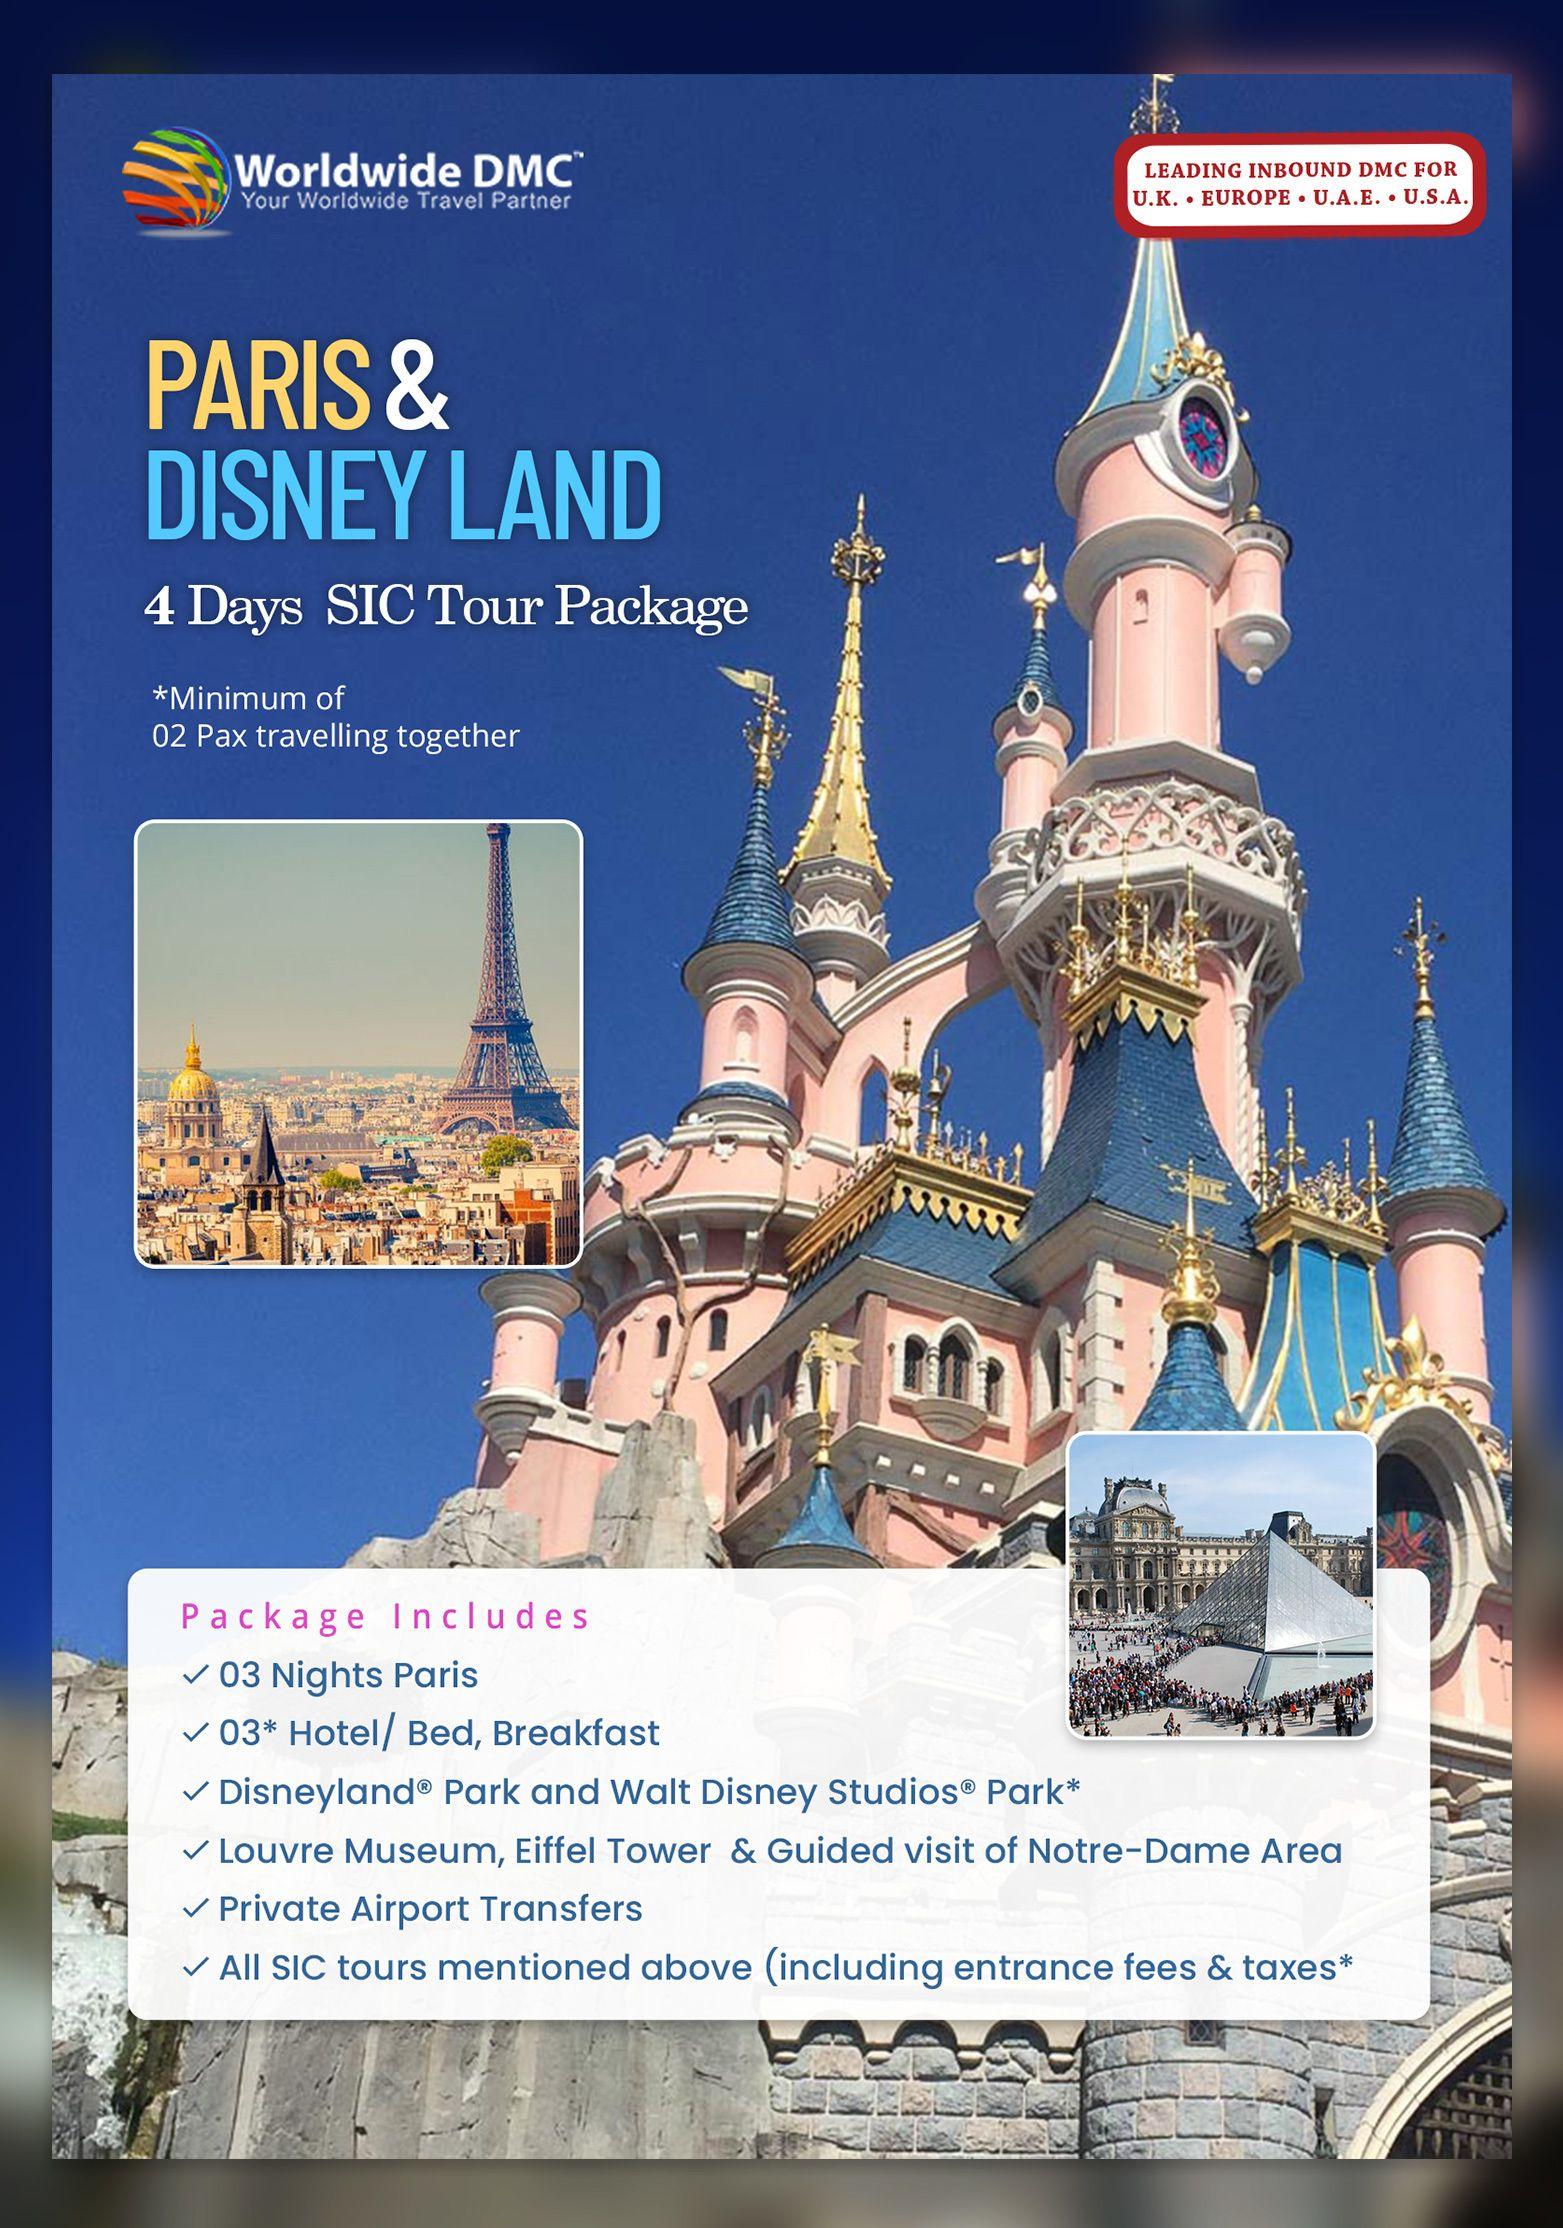 Paris With Disneyland Worldwide Dmc France Tour Packages Worldwide Dmc B2b Travel Wholesaler For Uk Europe Usa Uae Scandinavia Norway Sweden Denm Europe Tours Tour Packages Europe